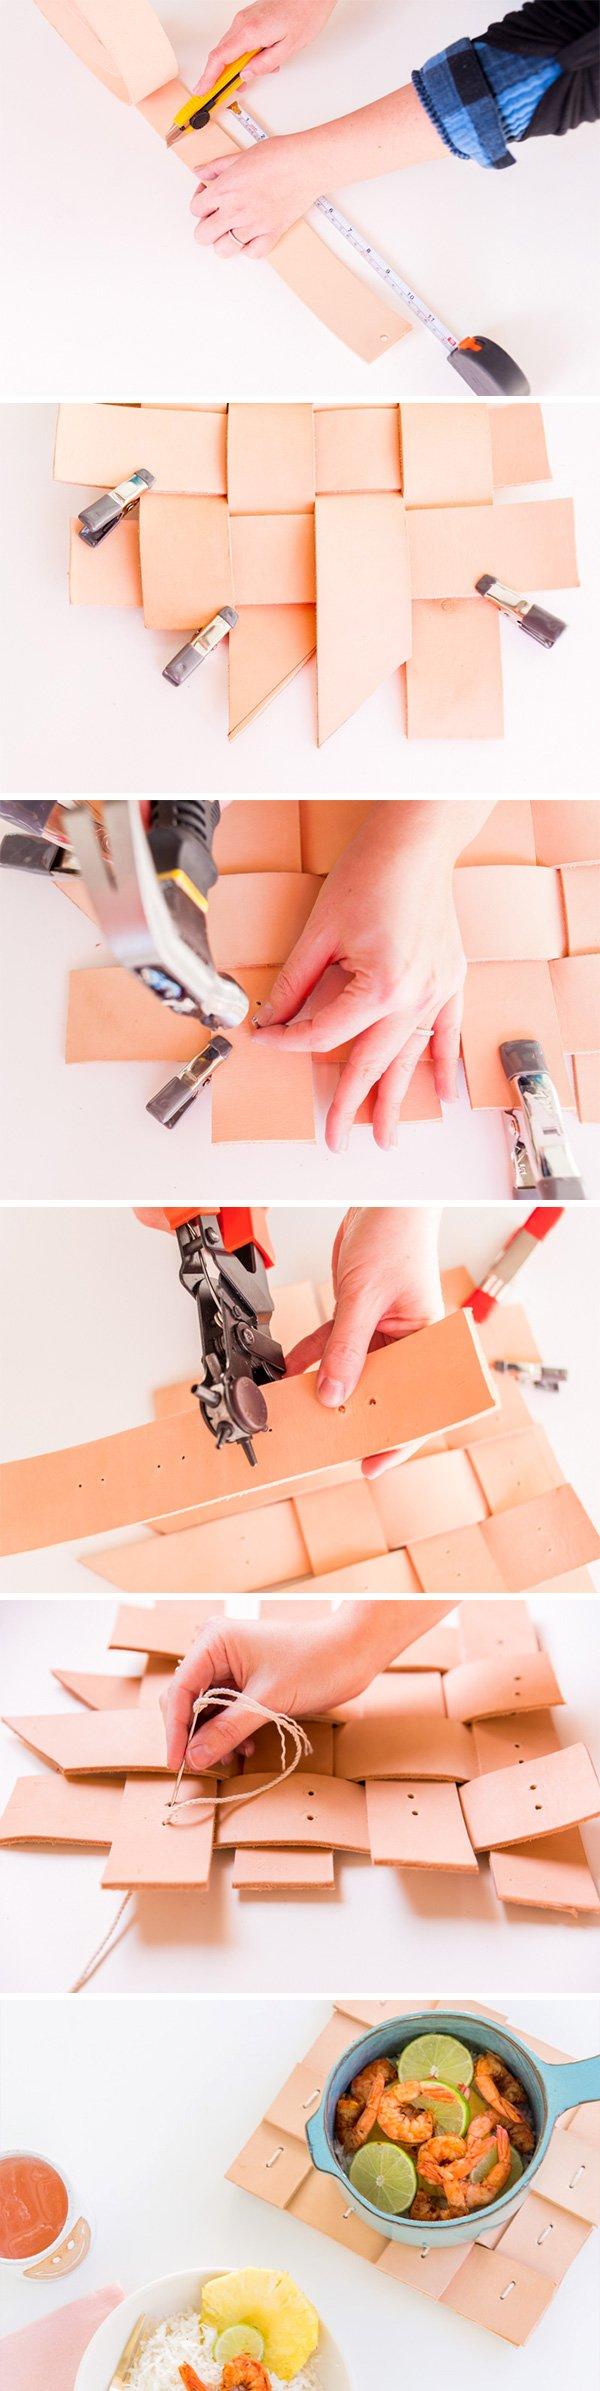 how-to-make-aleather-pot-holder